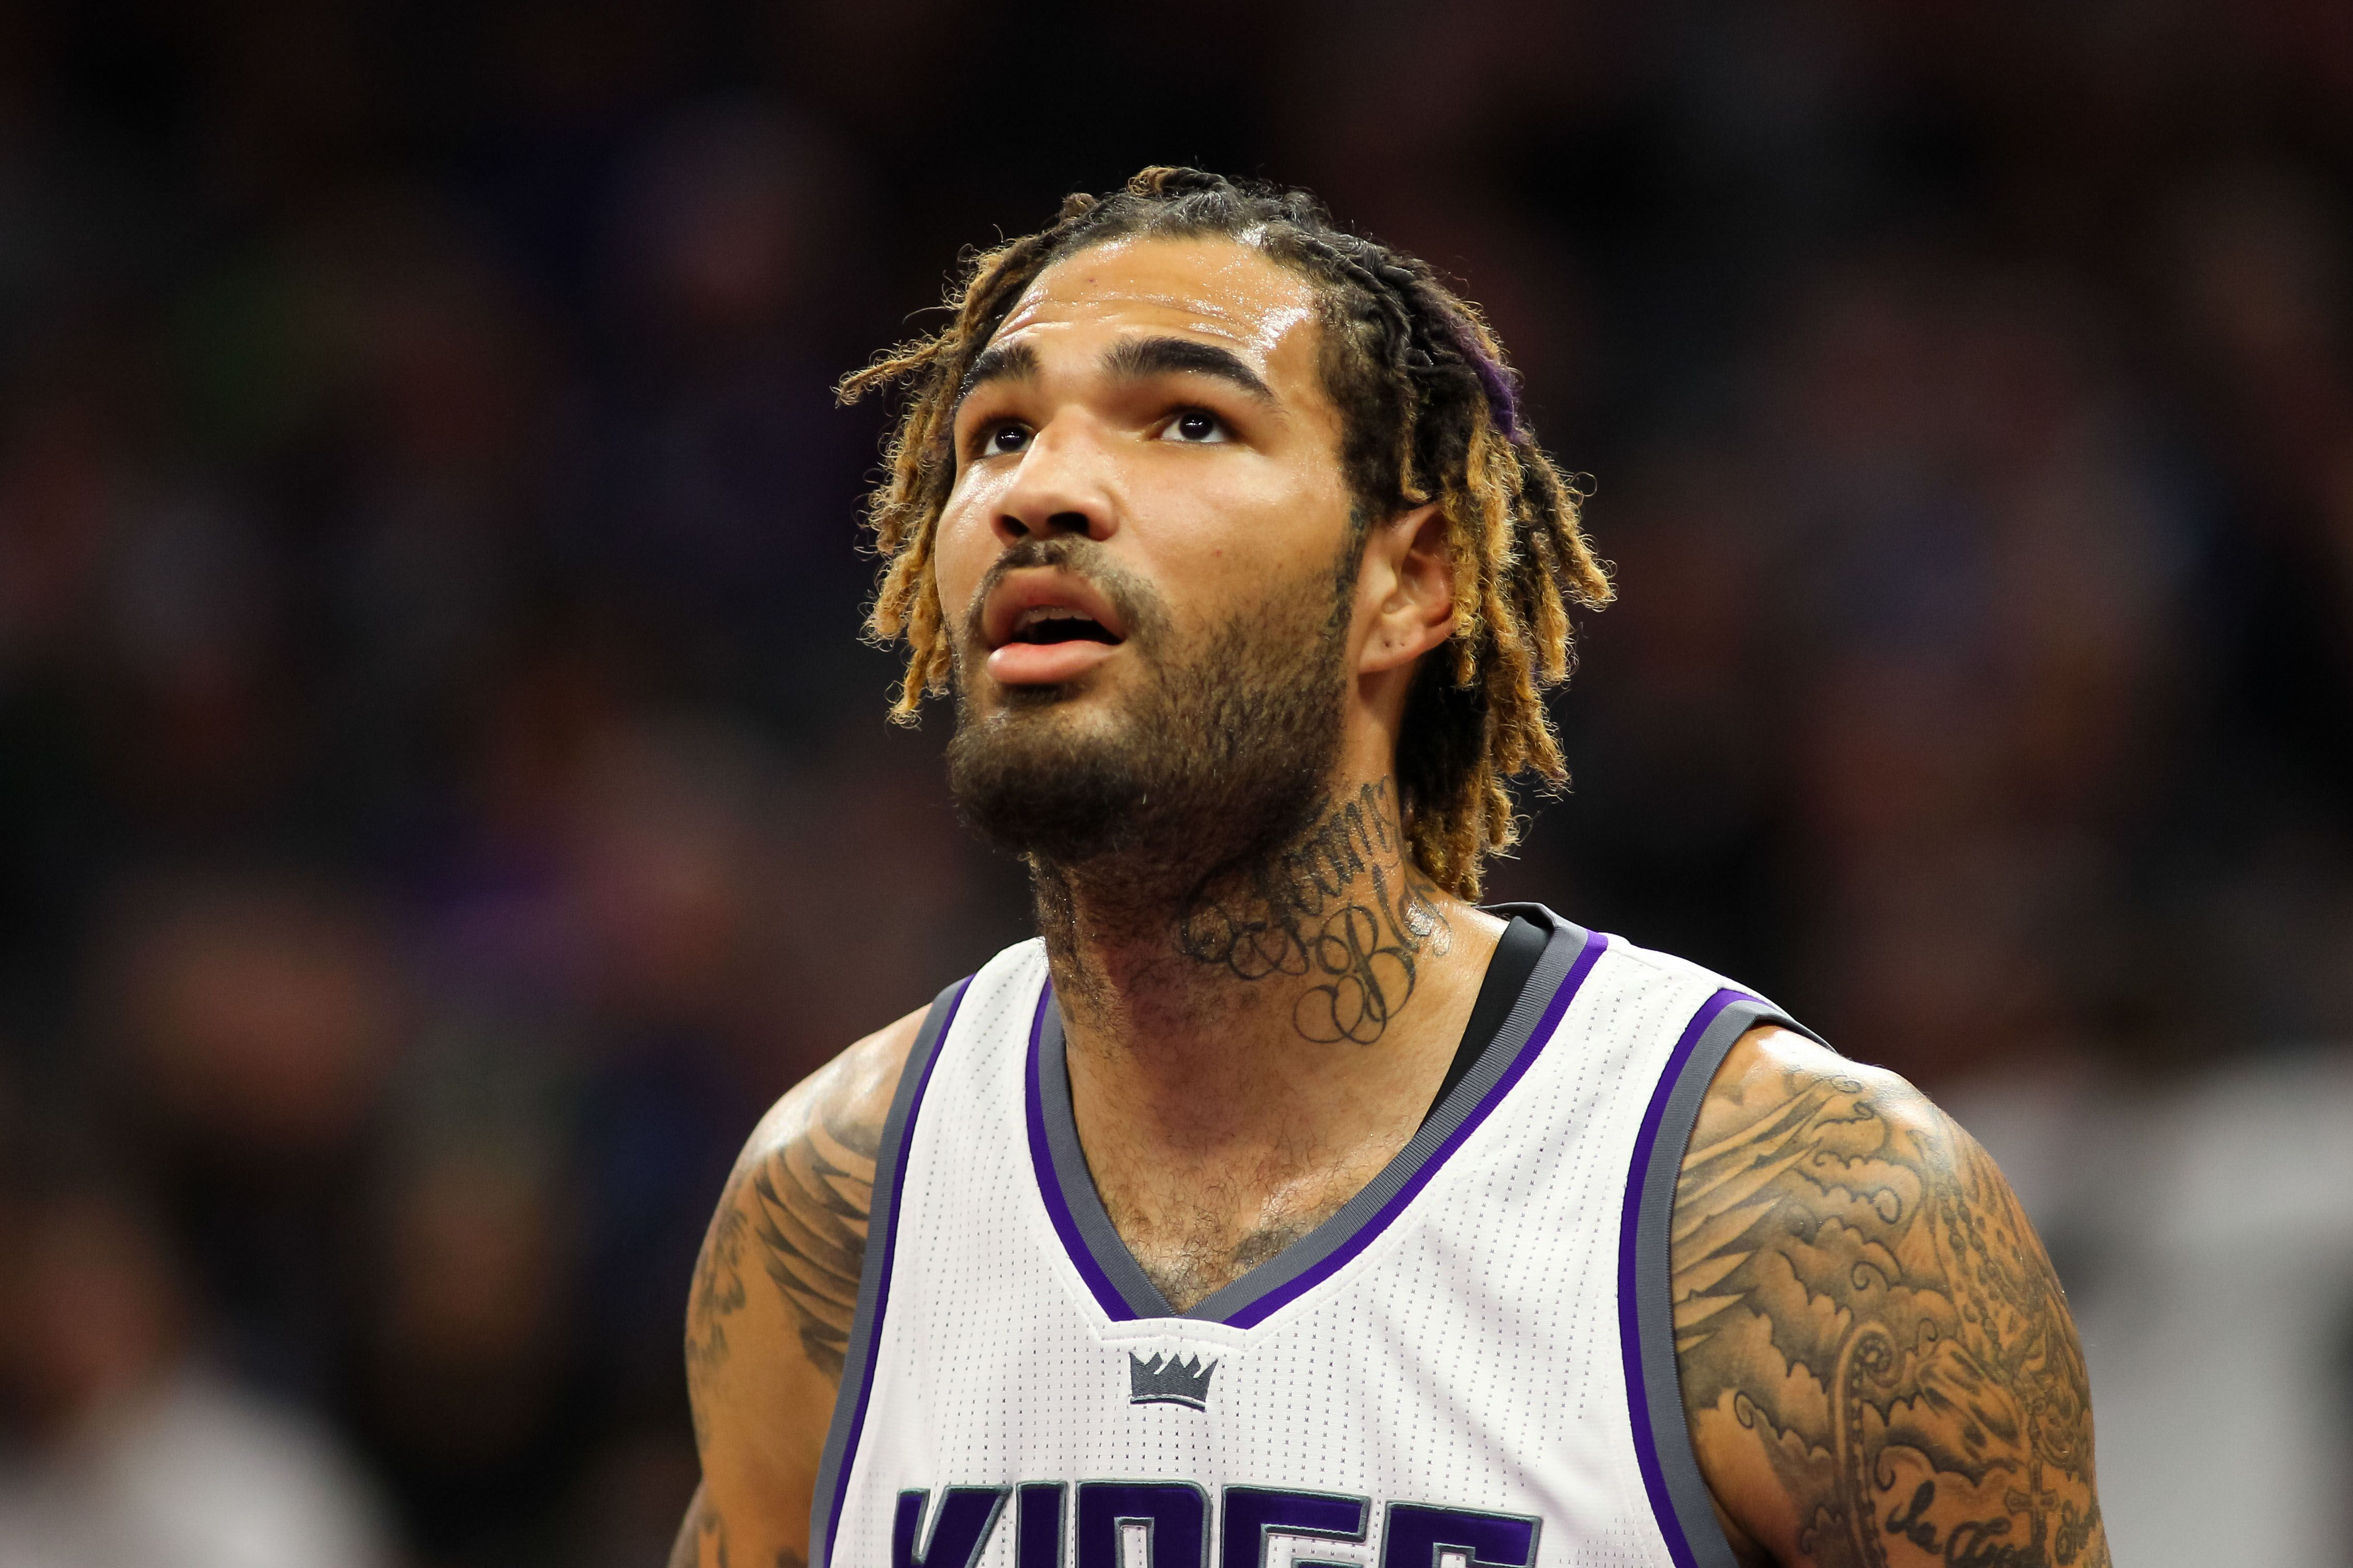 2017 Sec Championship >> Sacramento Kings: Assessing Willie Cauley-Stein's Emergence